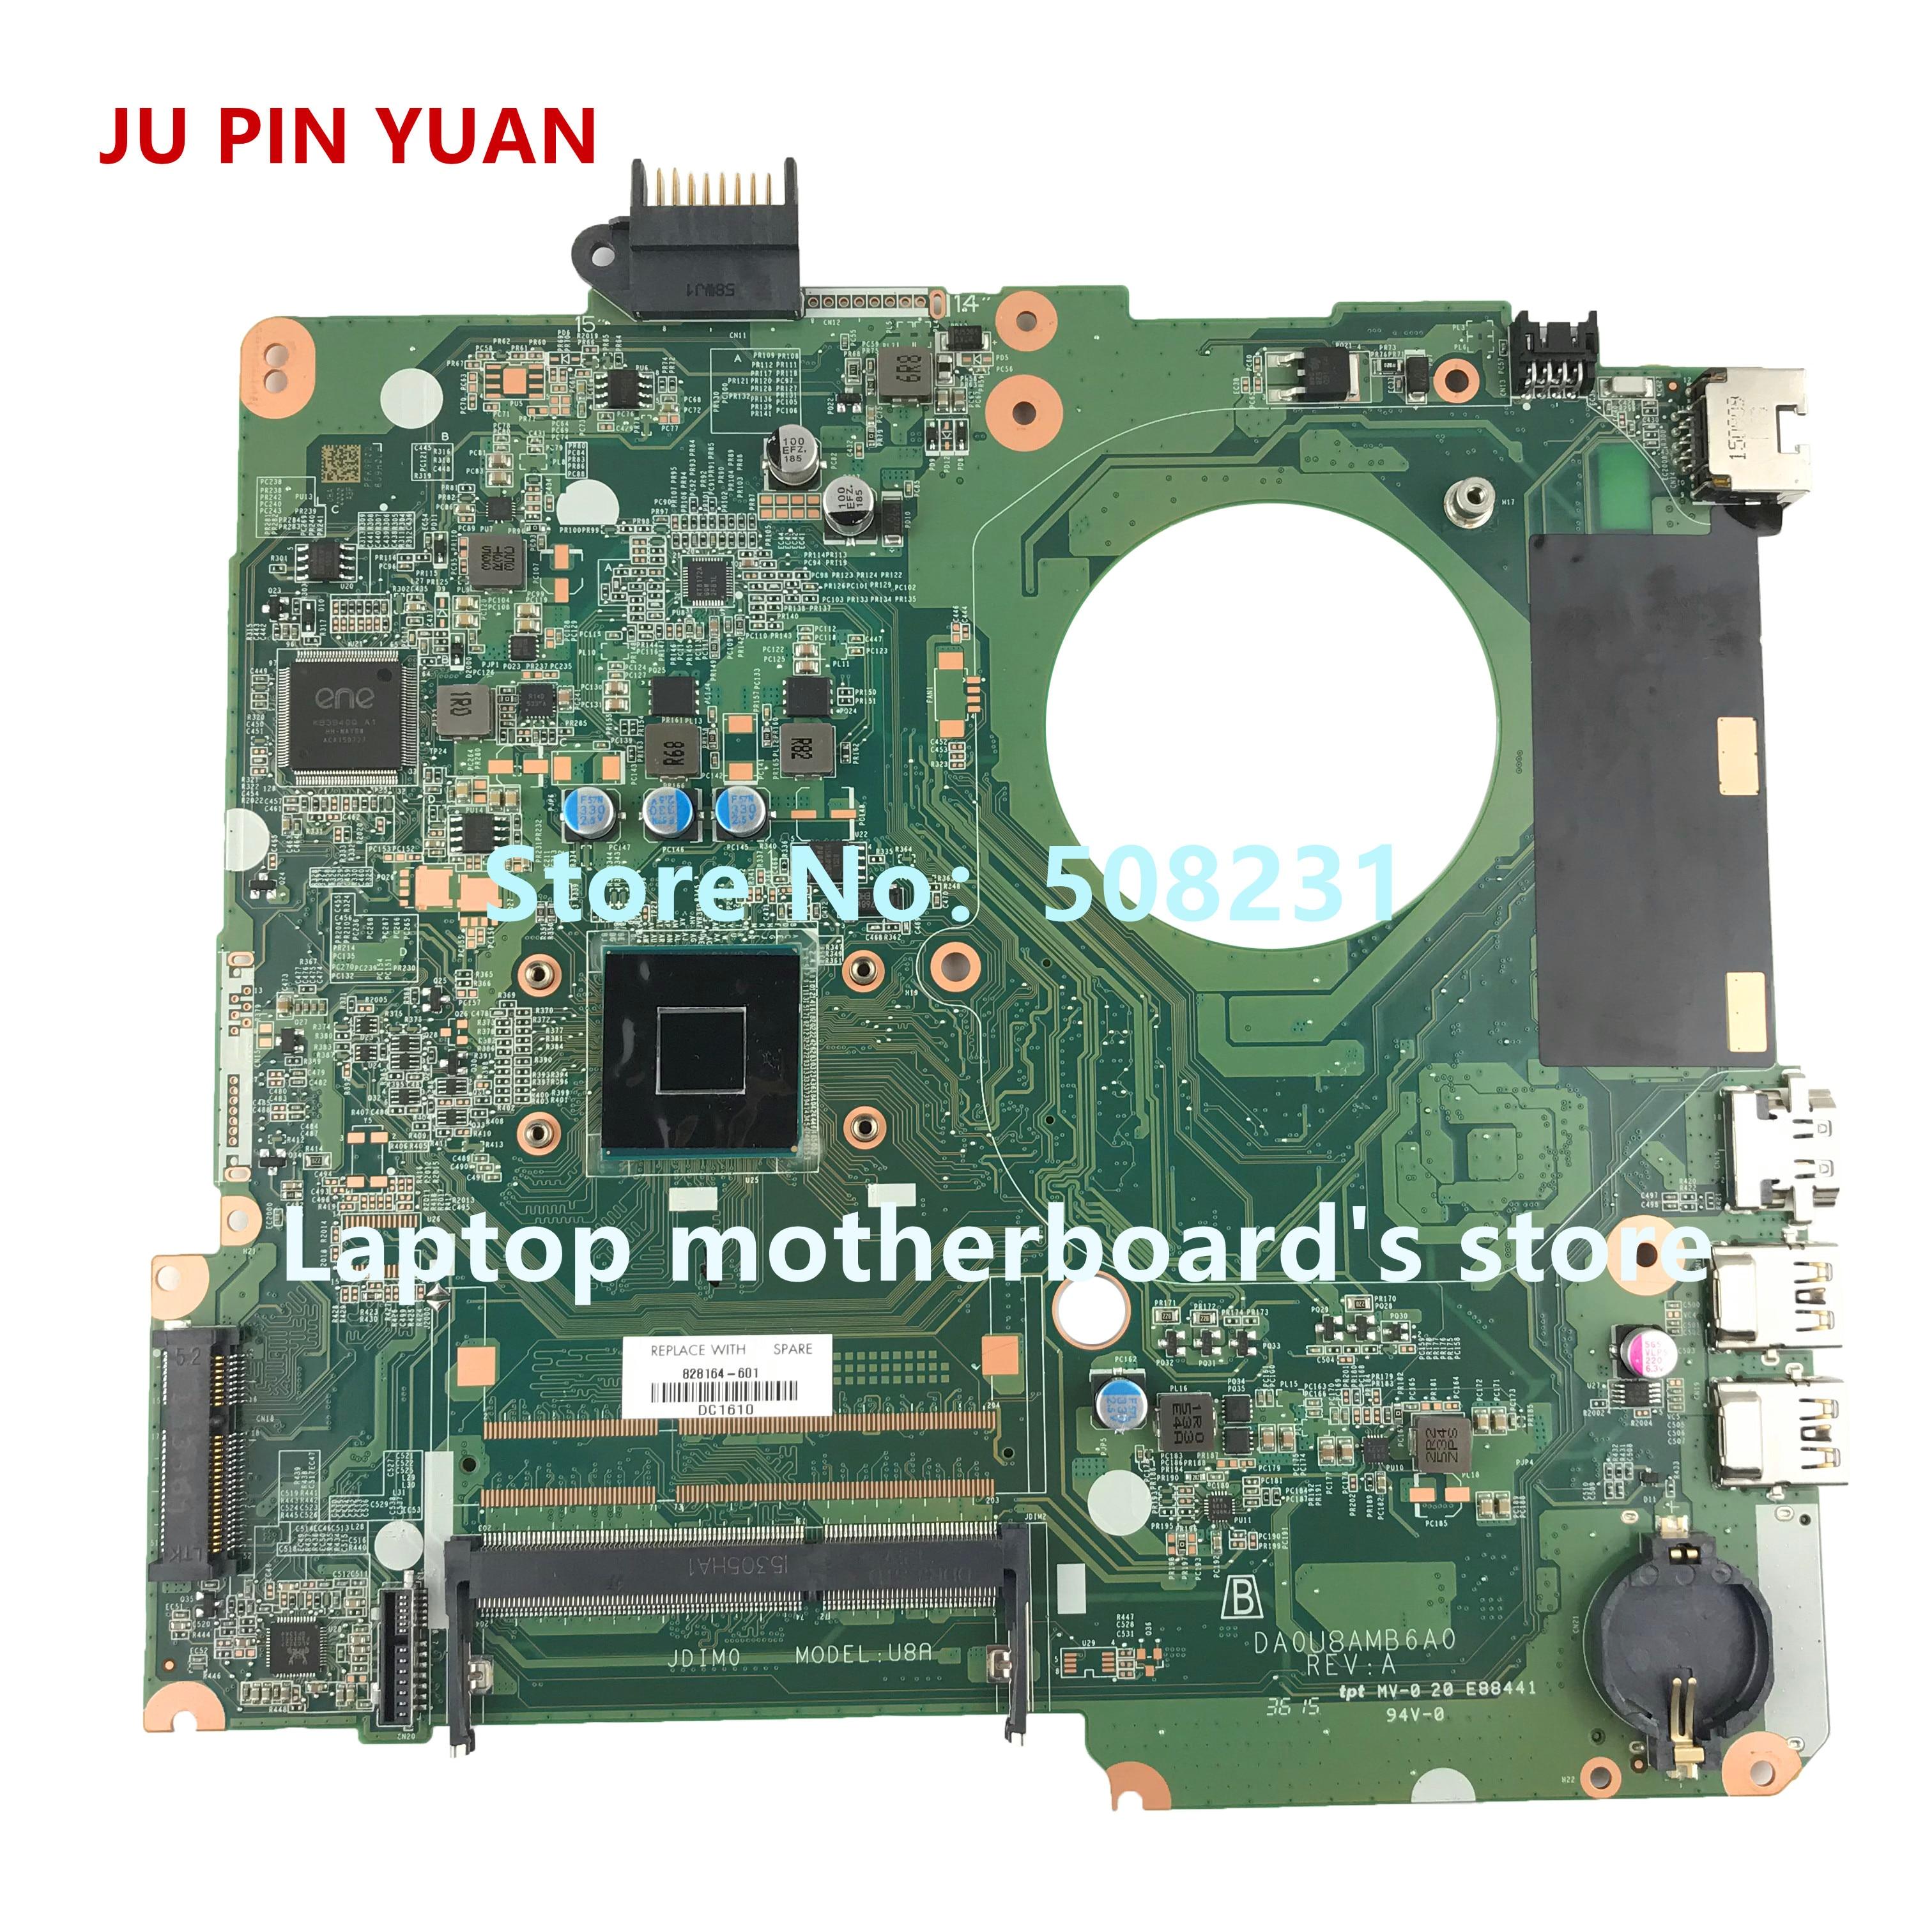 JU PIN YUAN 828164-601 828164-001 DA0U8AMB6A0 mainboard for HP Pavilion 15-F 15-F289NR Laptop motherboard CelN2840 fully TestedJU PIN YUAN 828164-601 828164-001 DA0U8AMB6A0 mainboard for HP Pavilion 15-F 15-F289NR Laptop motherboard CelN2840 fully Tested